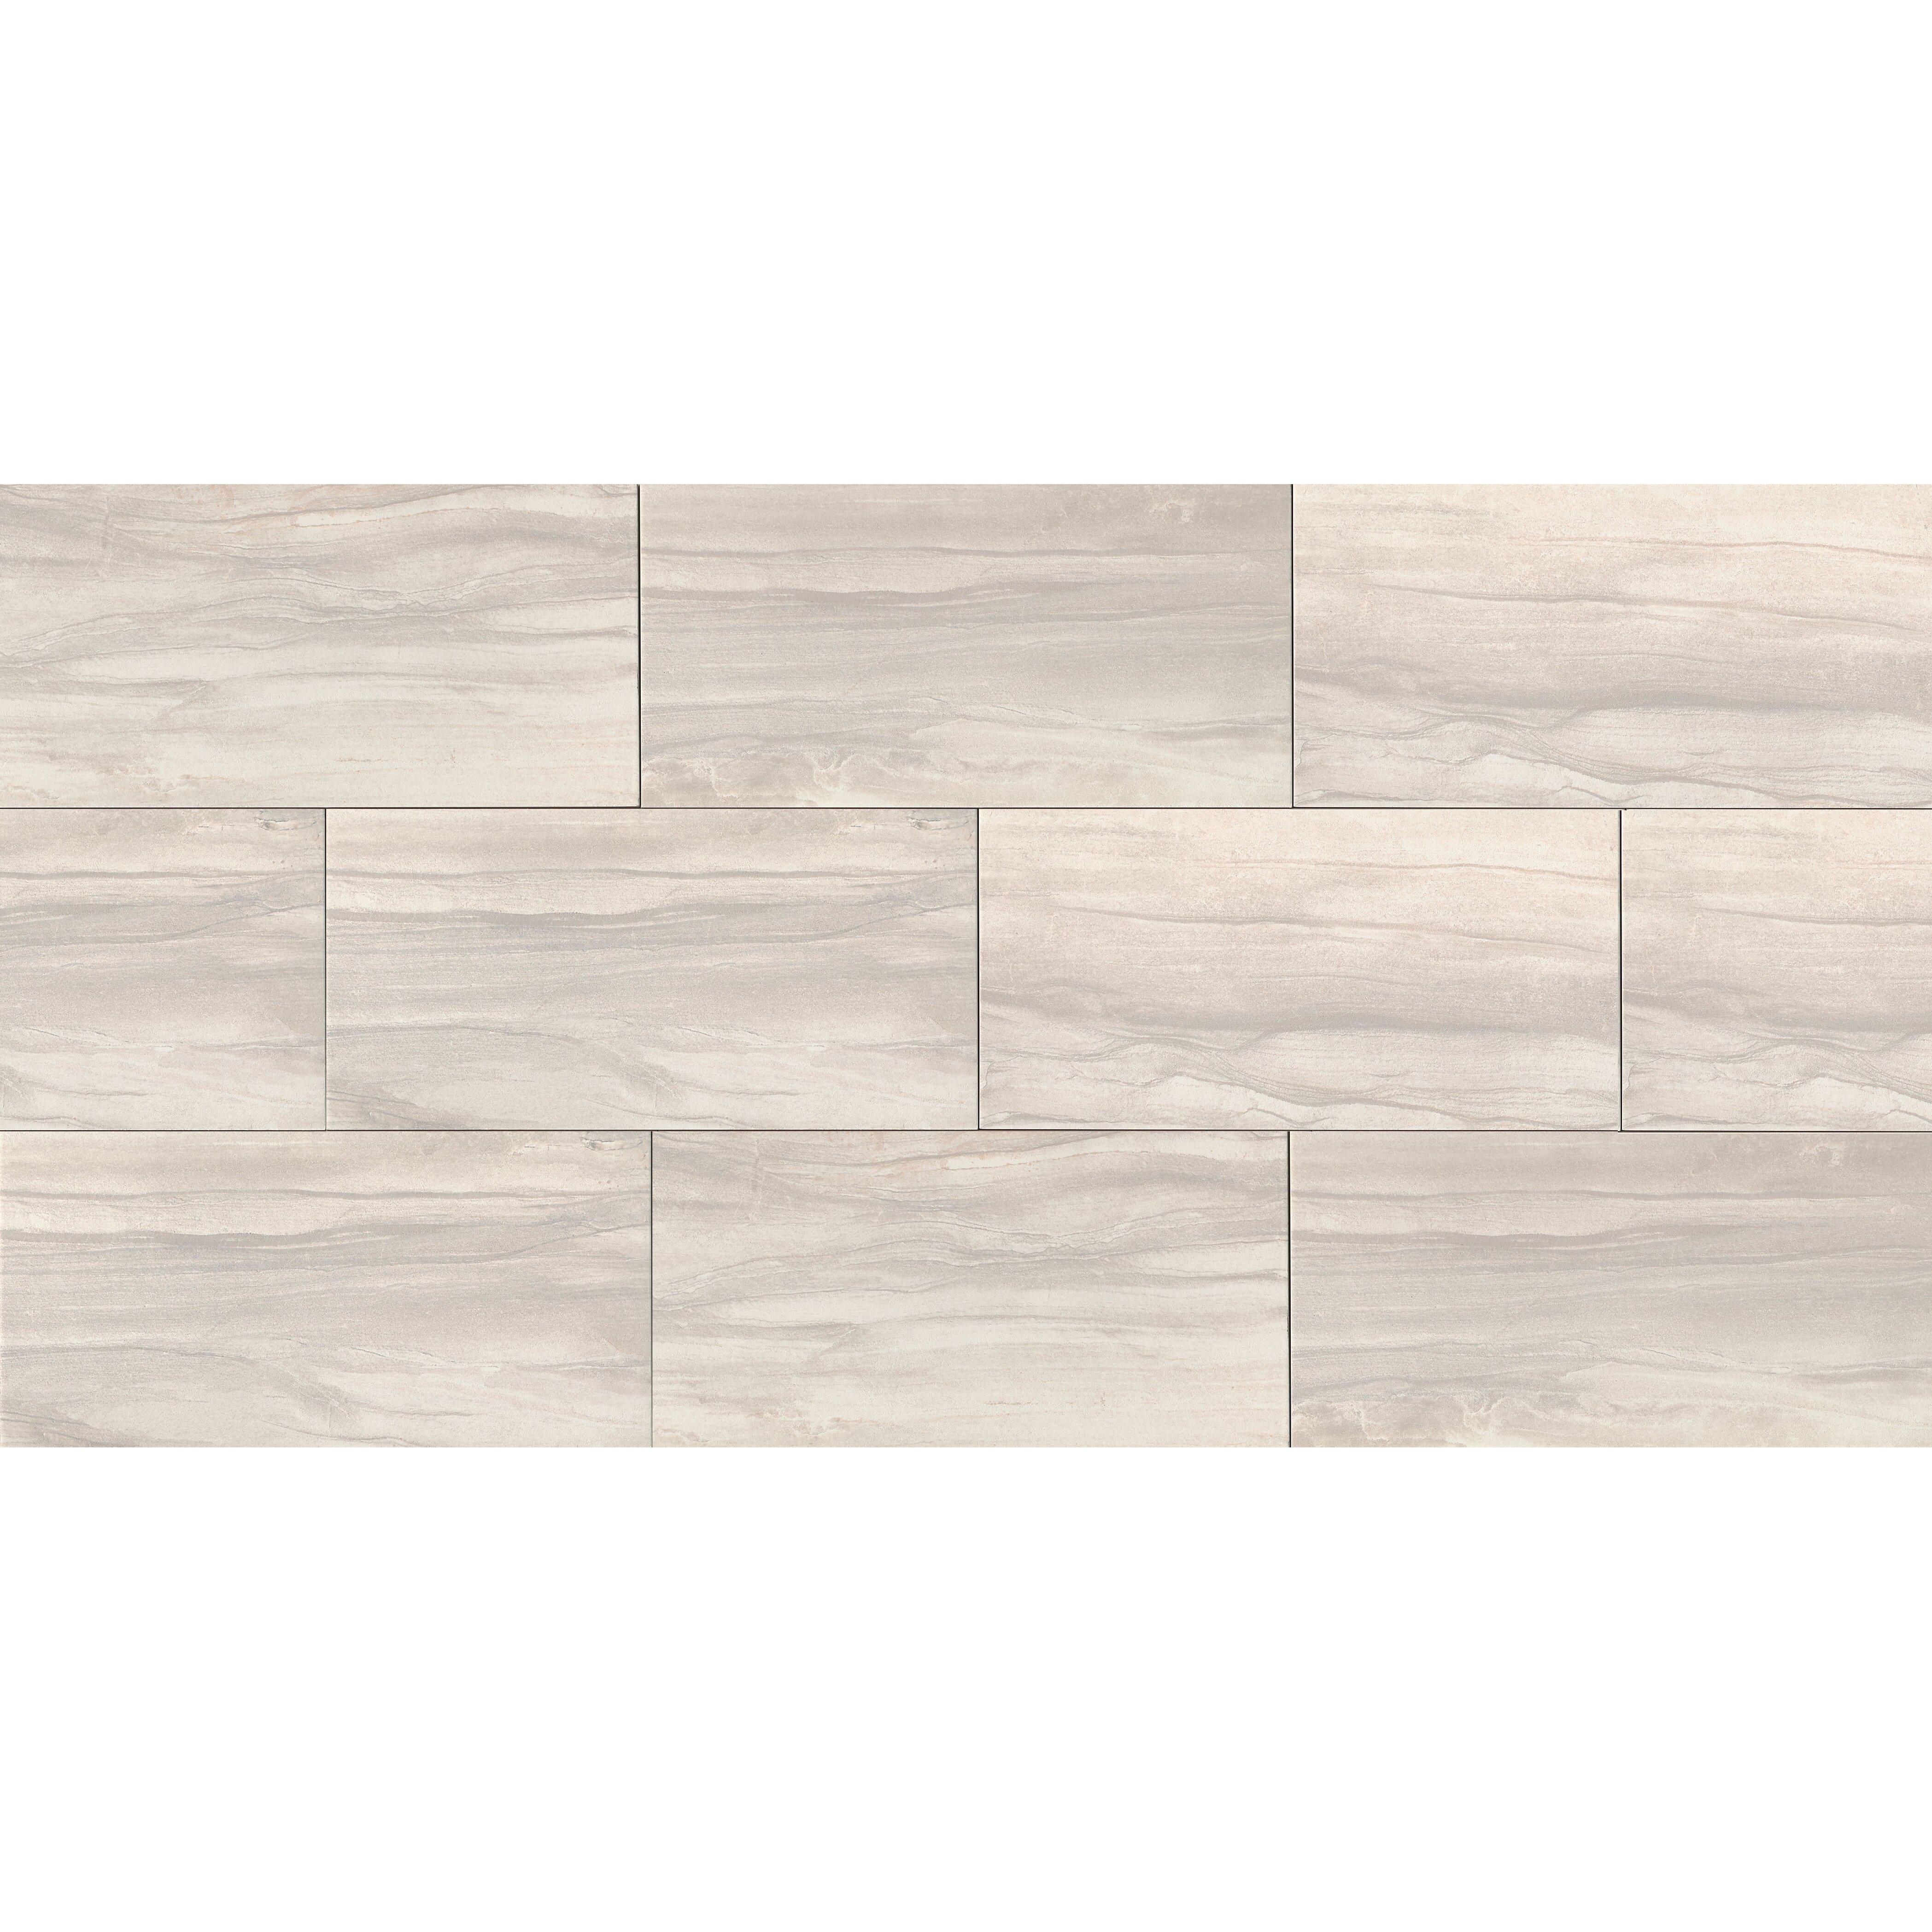 Athena 12 x 24 porcelain field tile in pearl wayfair for 12 x 24 ceramic floor tile